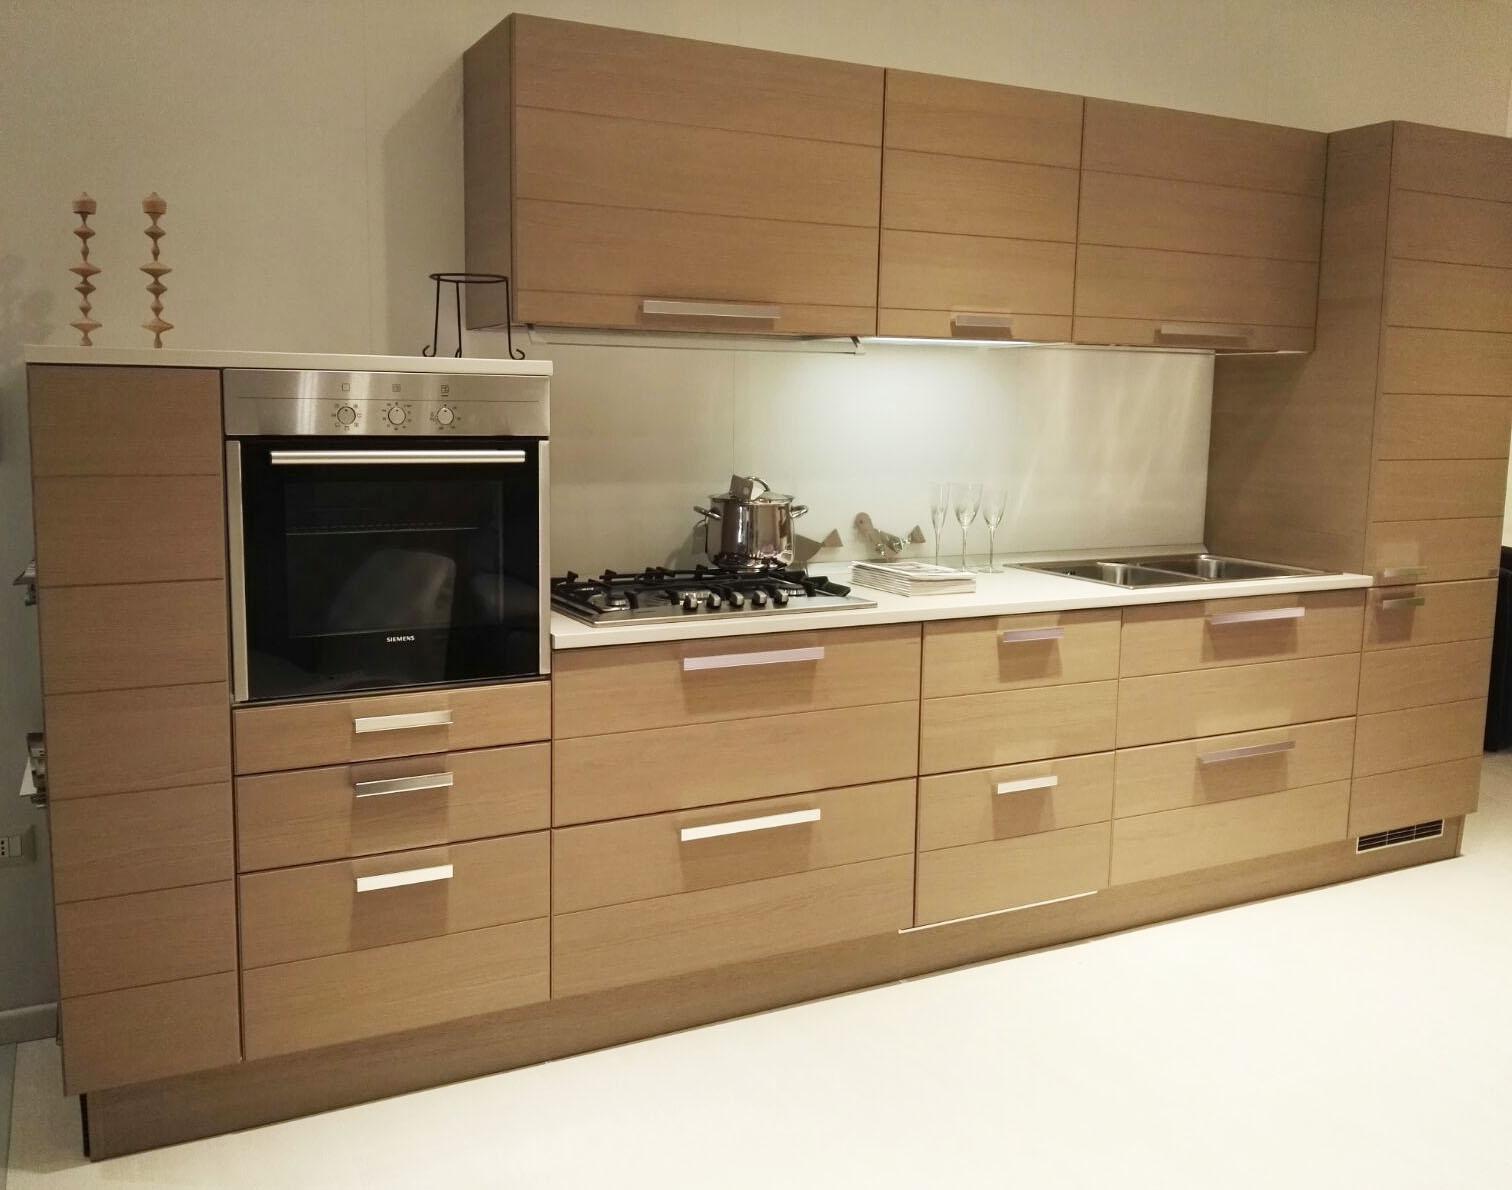 Cucina scavolini open moderna legno cucine a prezzi scontati for Cucina living